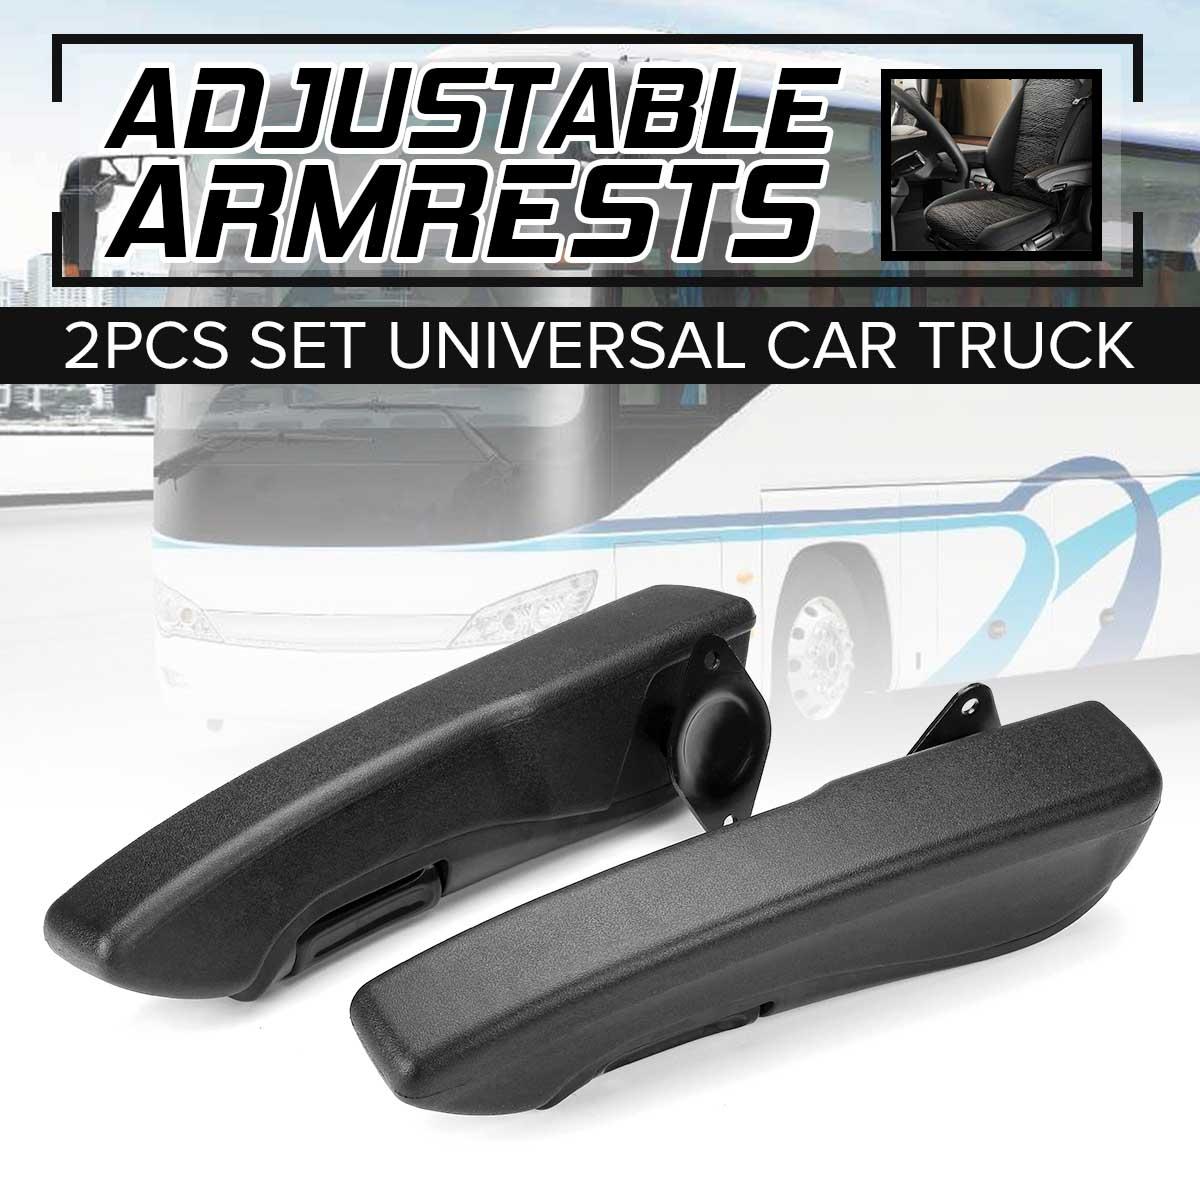 Pair Universal Car Truck Adjustable Seat Armrest Hand Holder For RV Caravan Trailer Boat